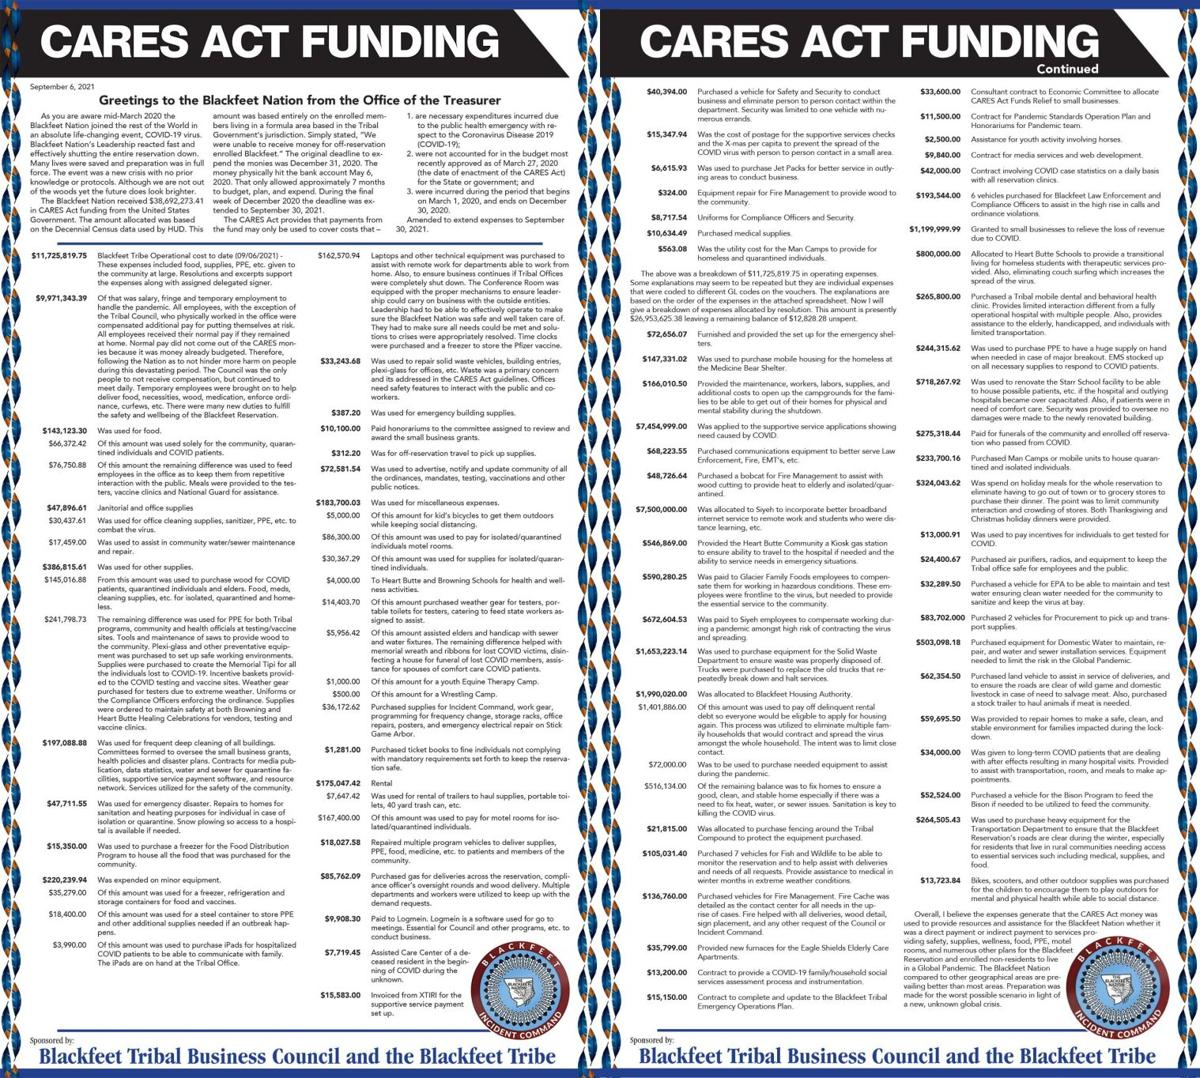 Blackfeet Treasurer explains how CARES Act funding was spent